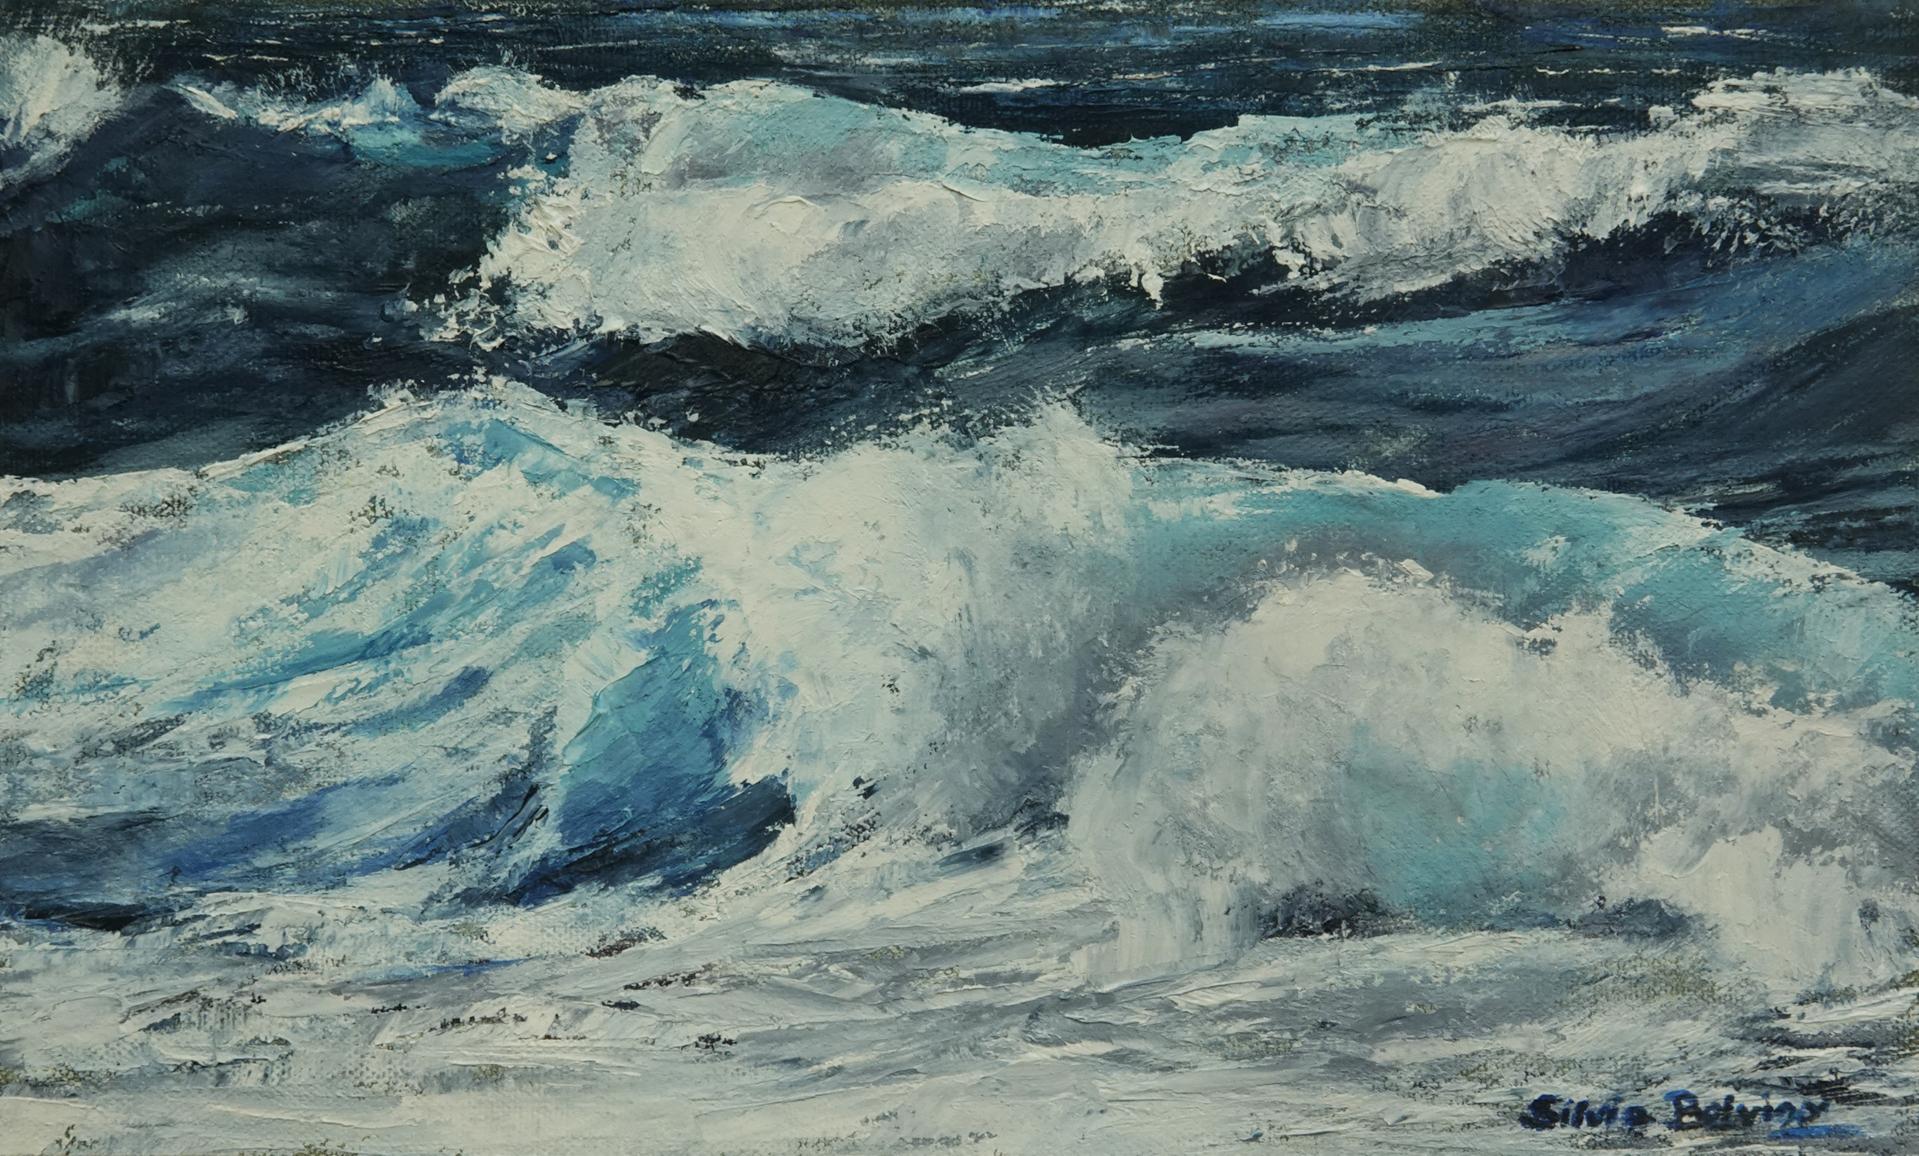 Turquoise Ocean by Silvia Belviso